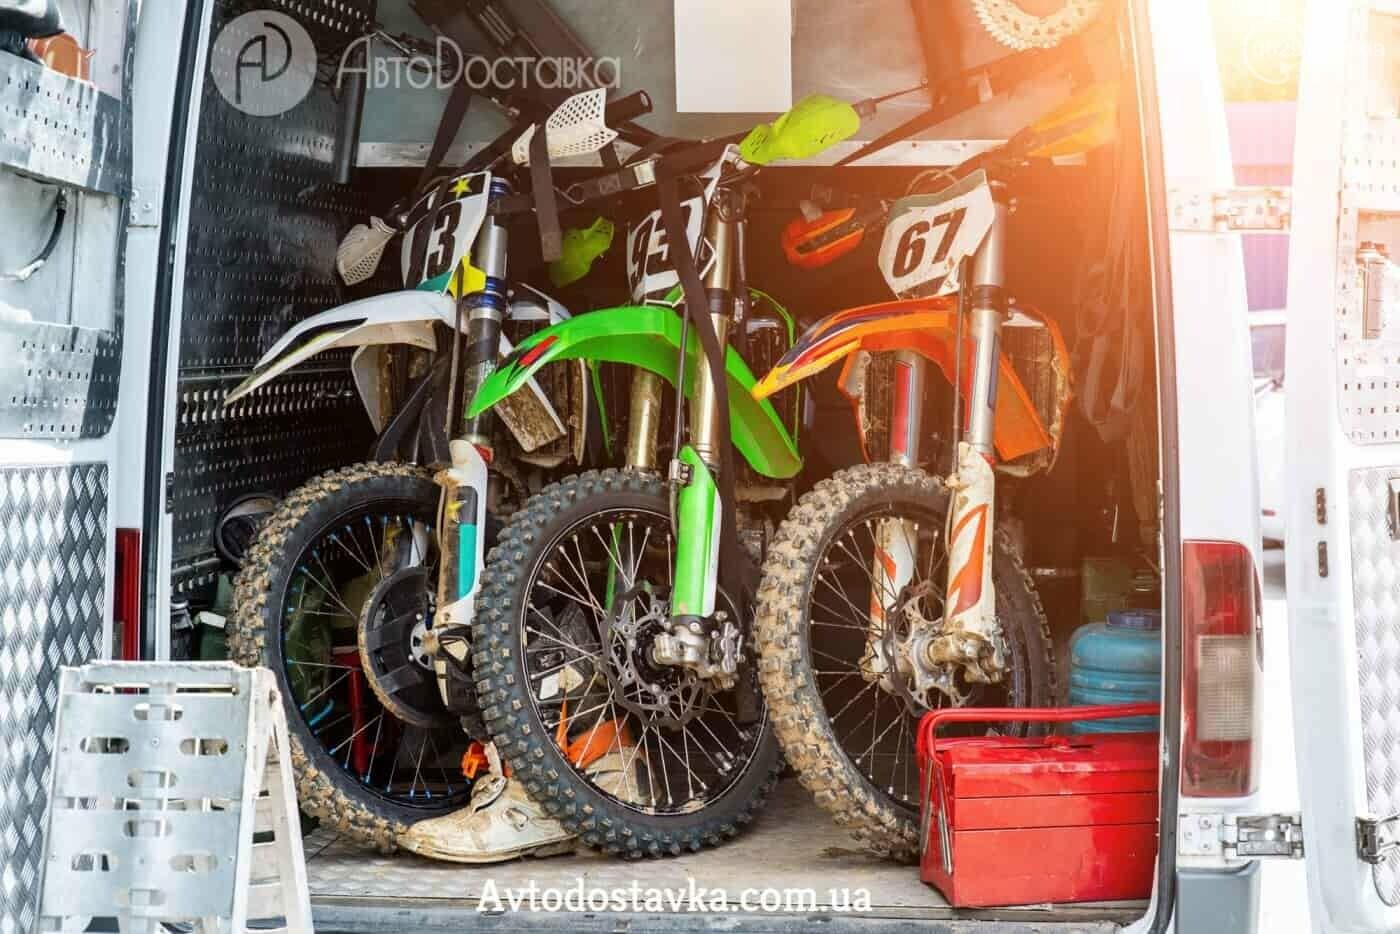 Перевозка мотоцикла по Украине - Автодоставка, фото-7